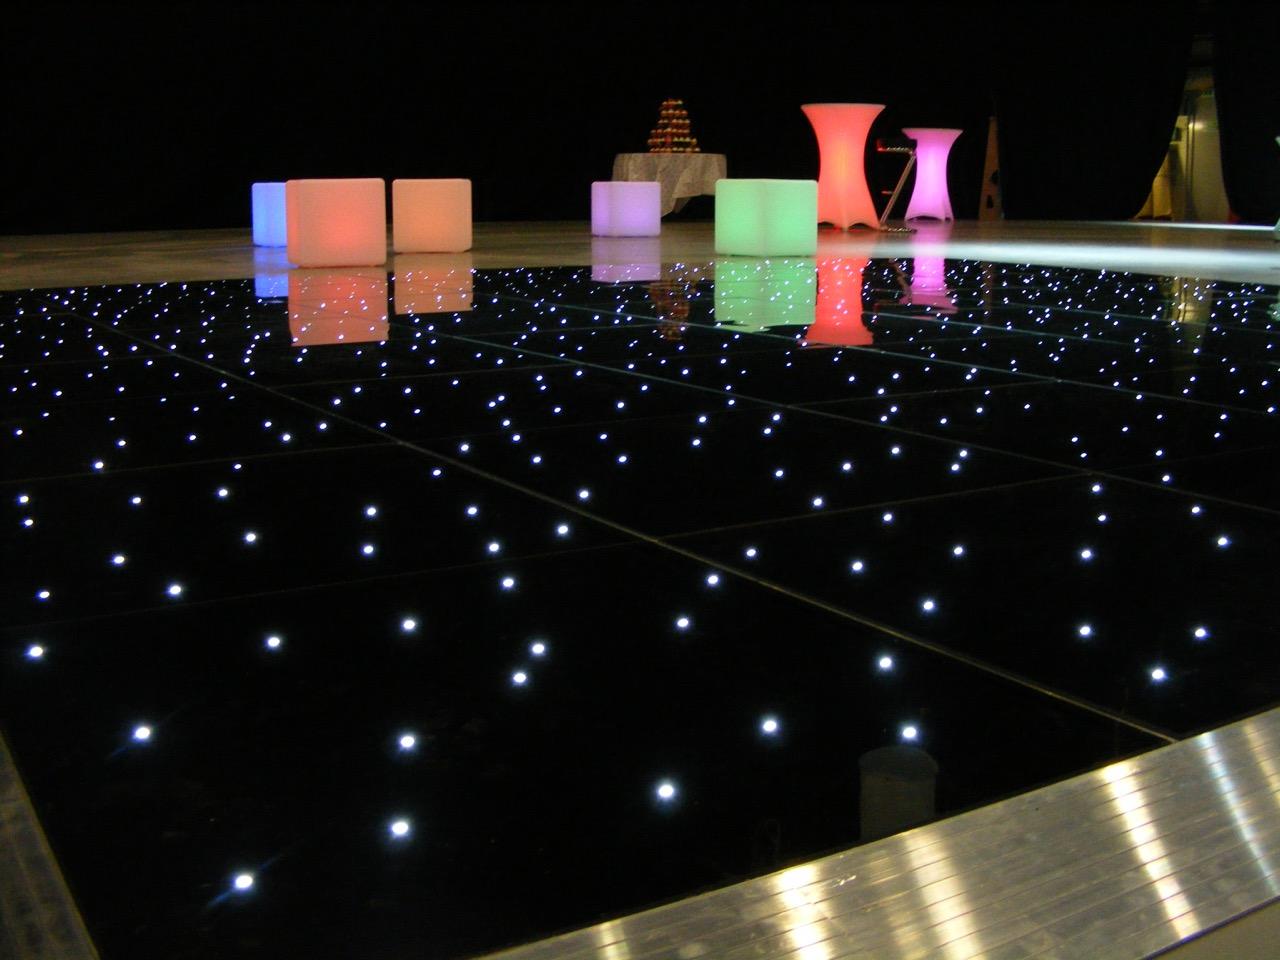 Black led dance floor with led furniture